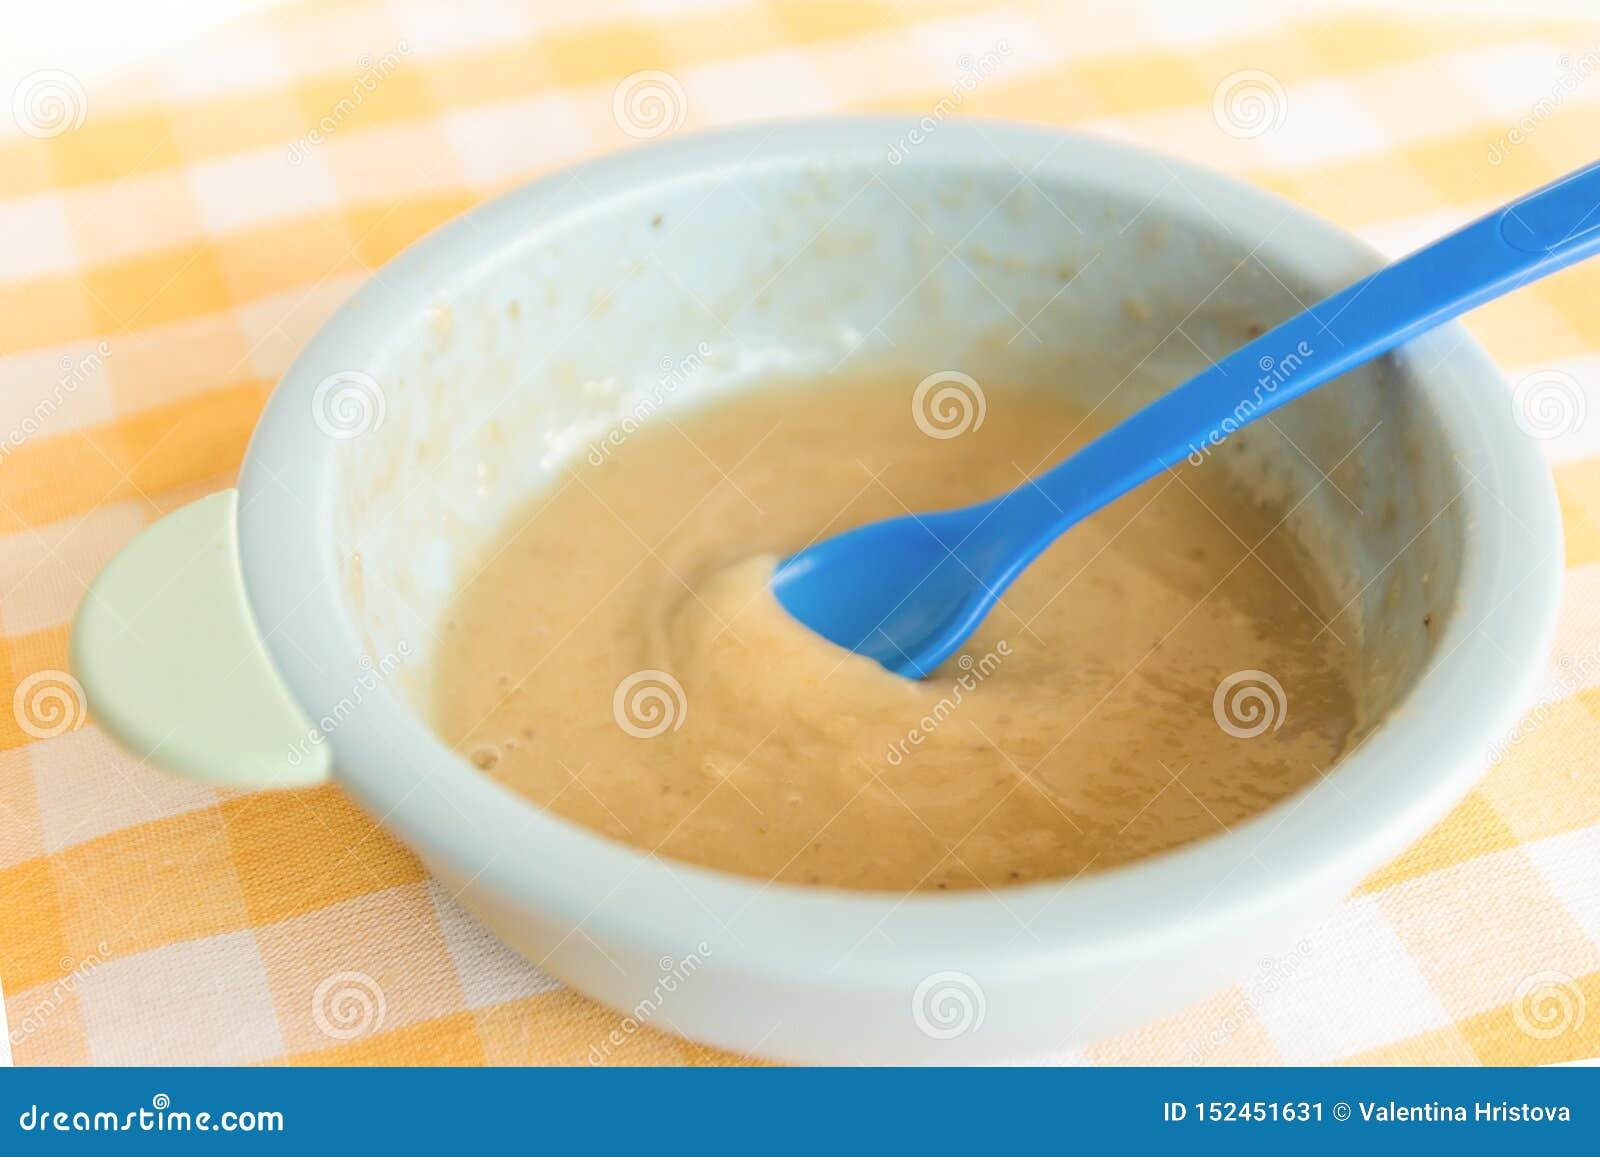 alimentos hechos de leche